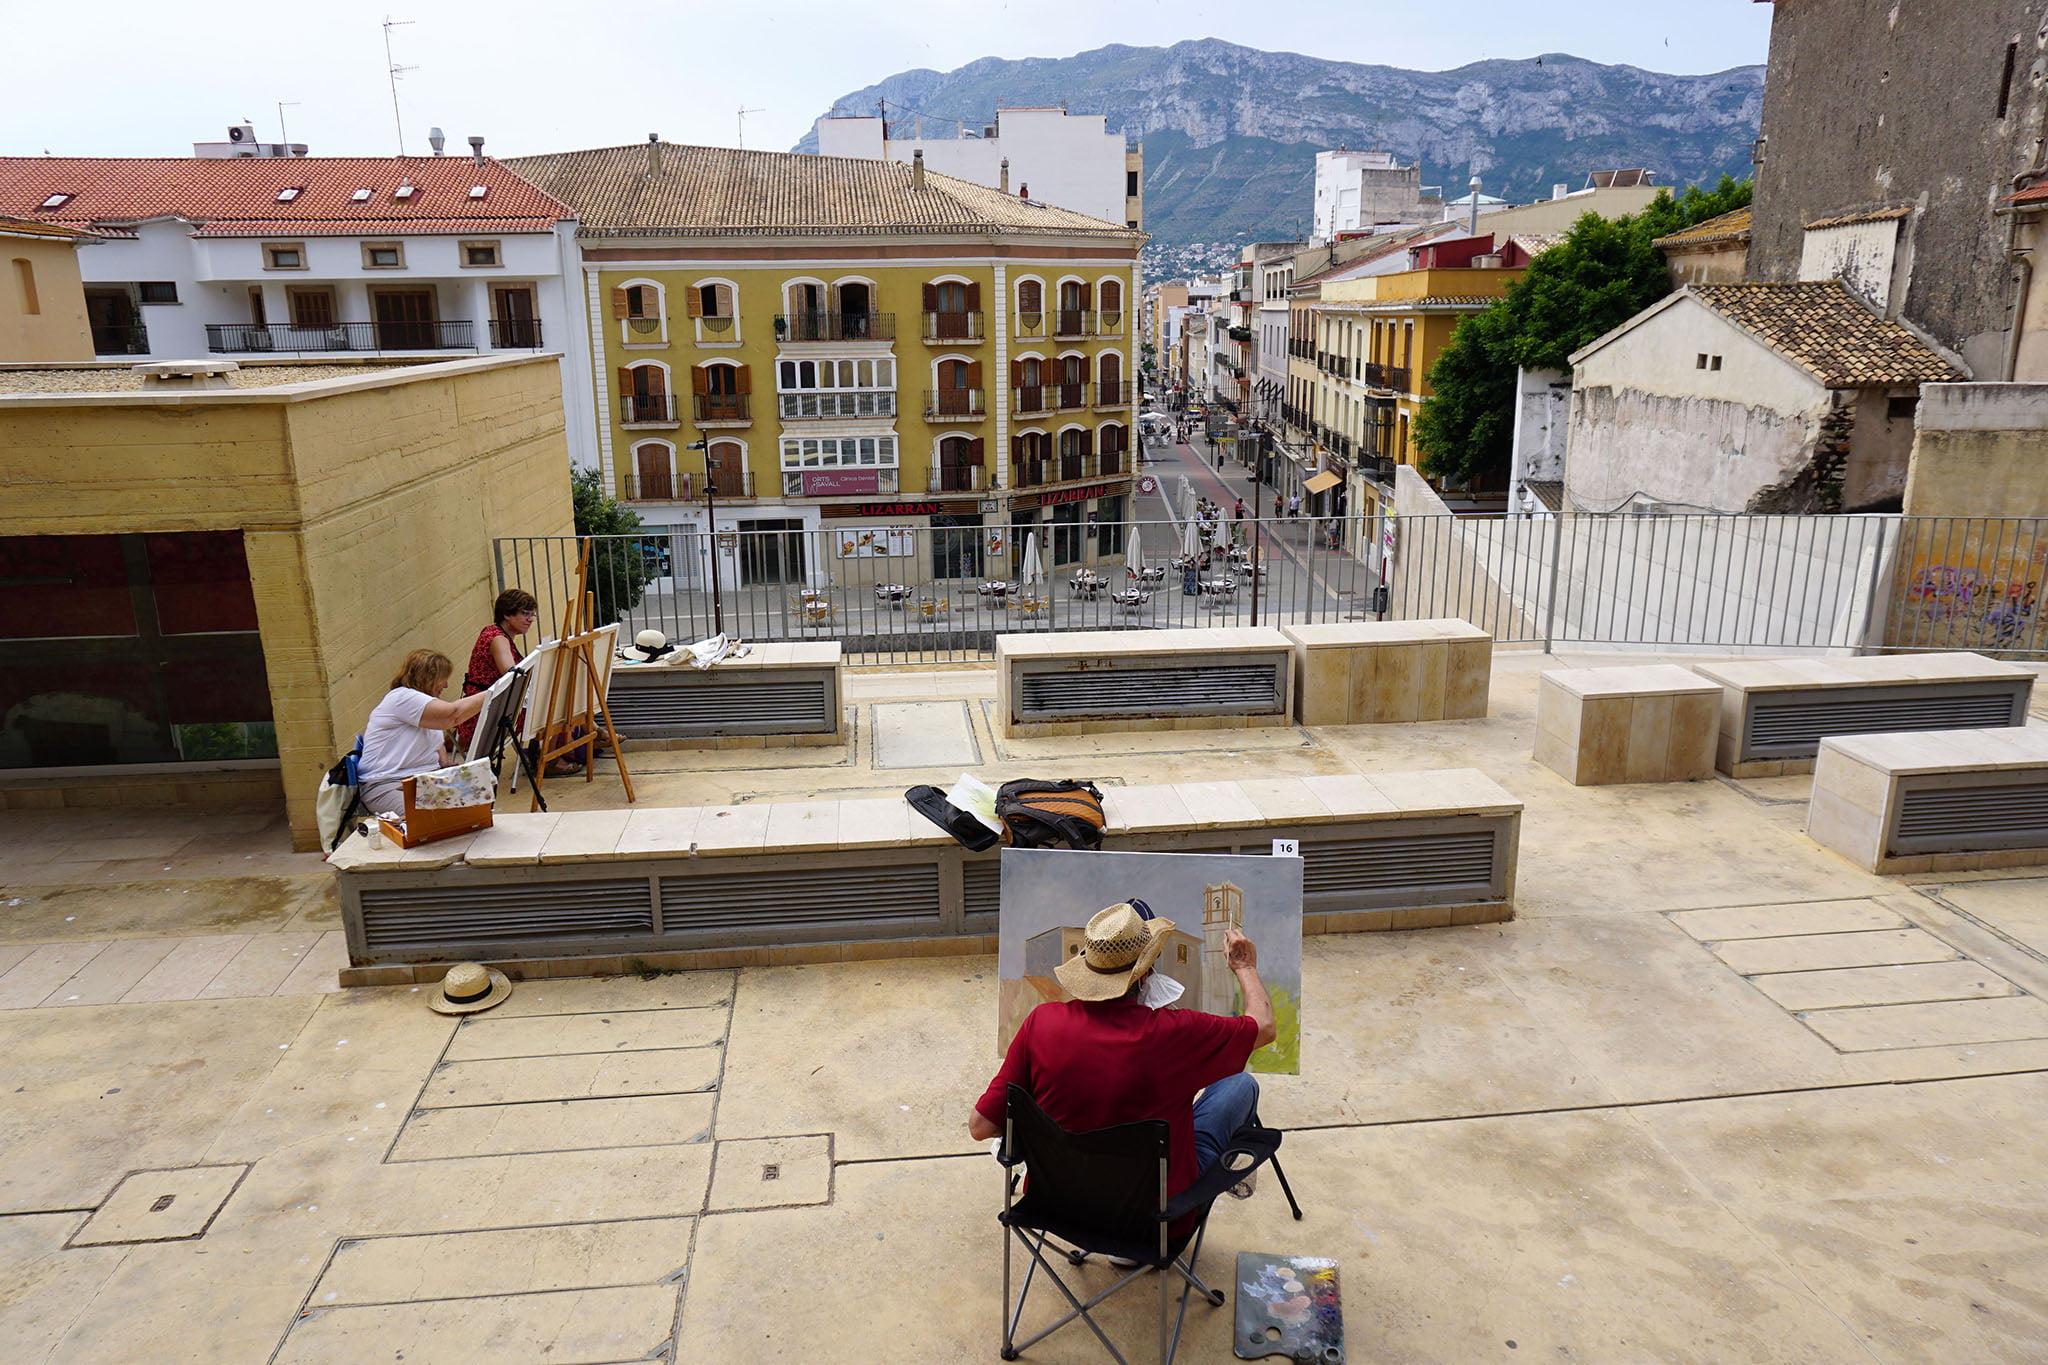 Concursantes participando en el Concurs de pintura ràpida %22Ciutat de Dénia%22 | Fotografía de Javier Ruiz 'Txin'